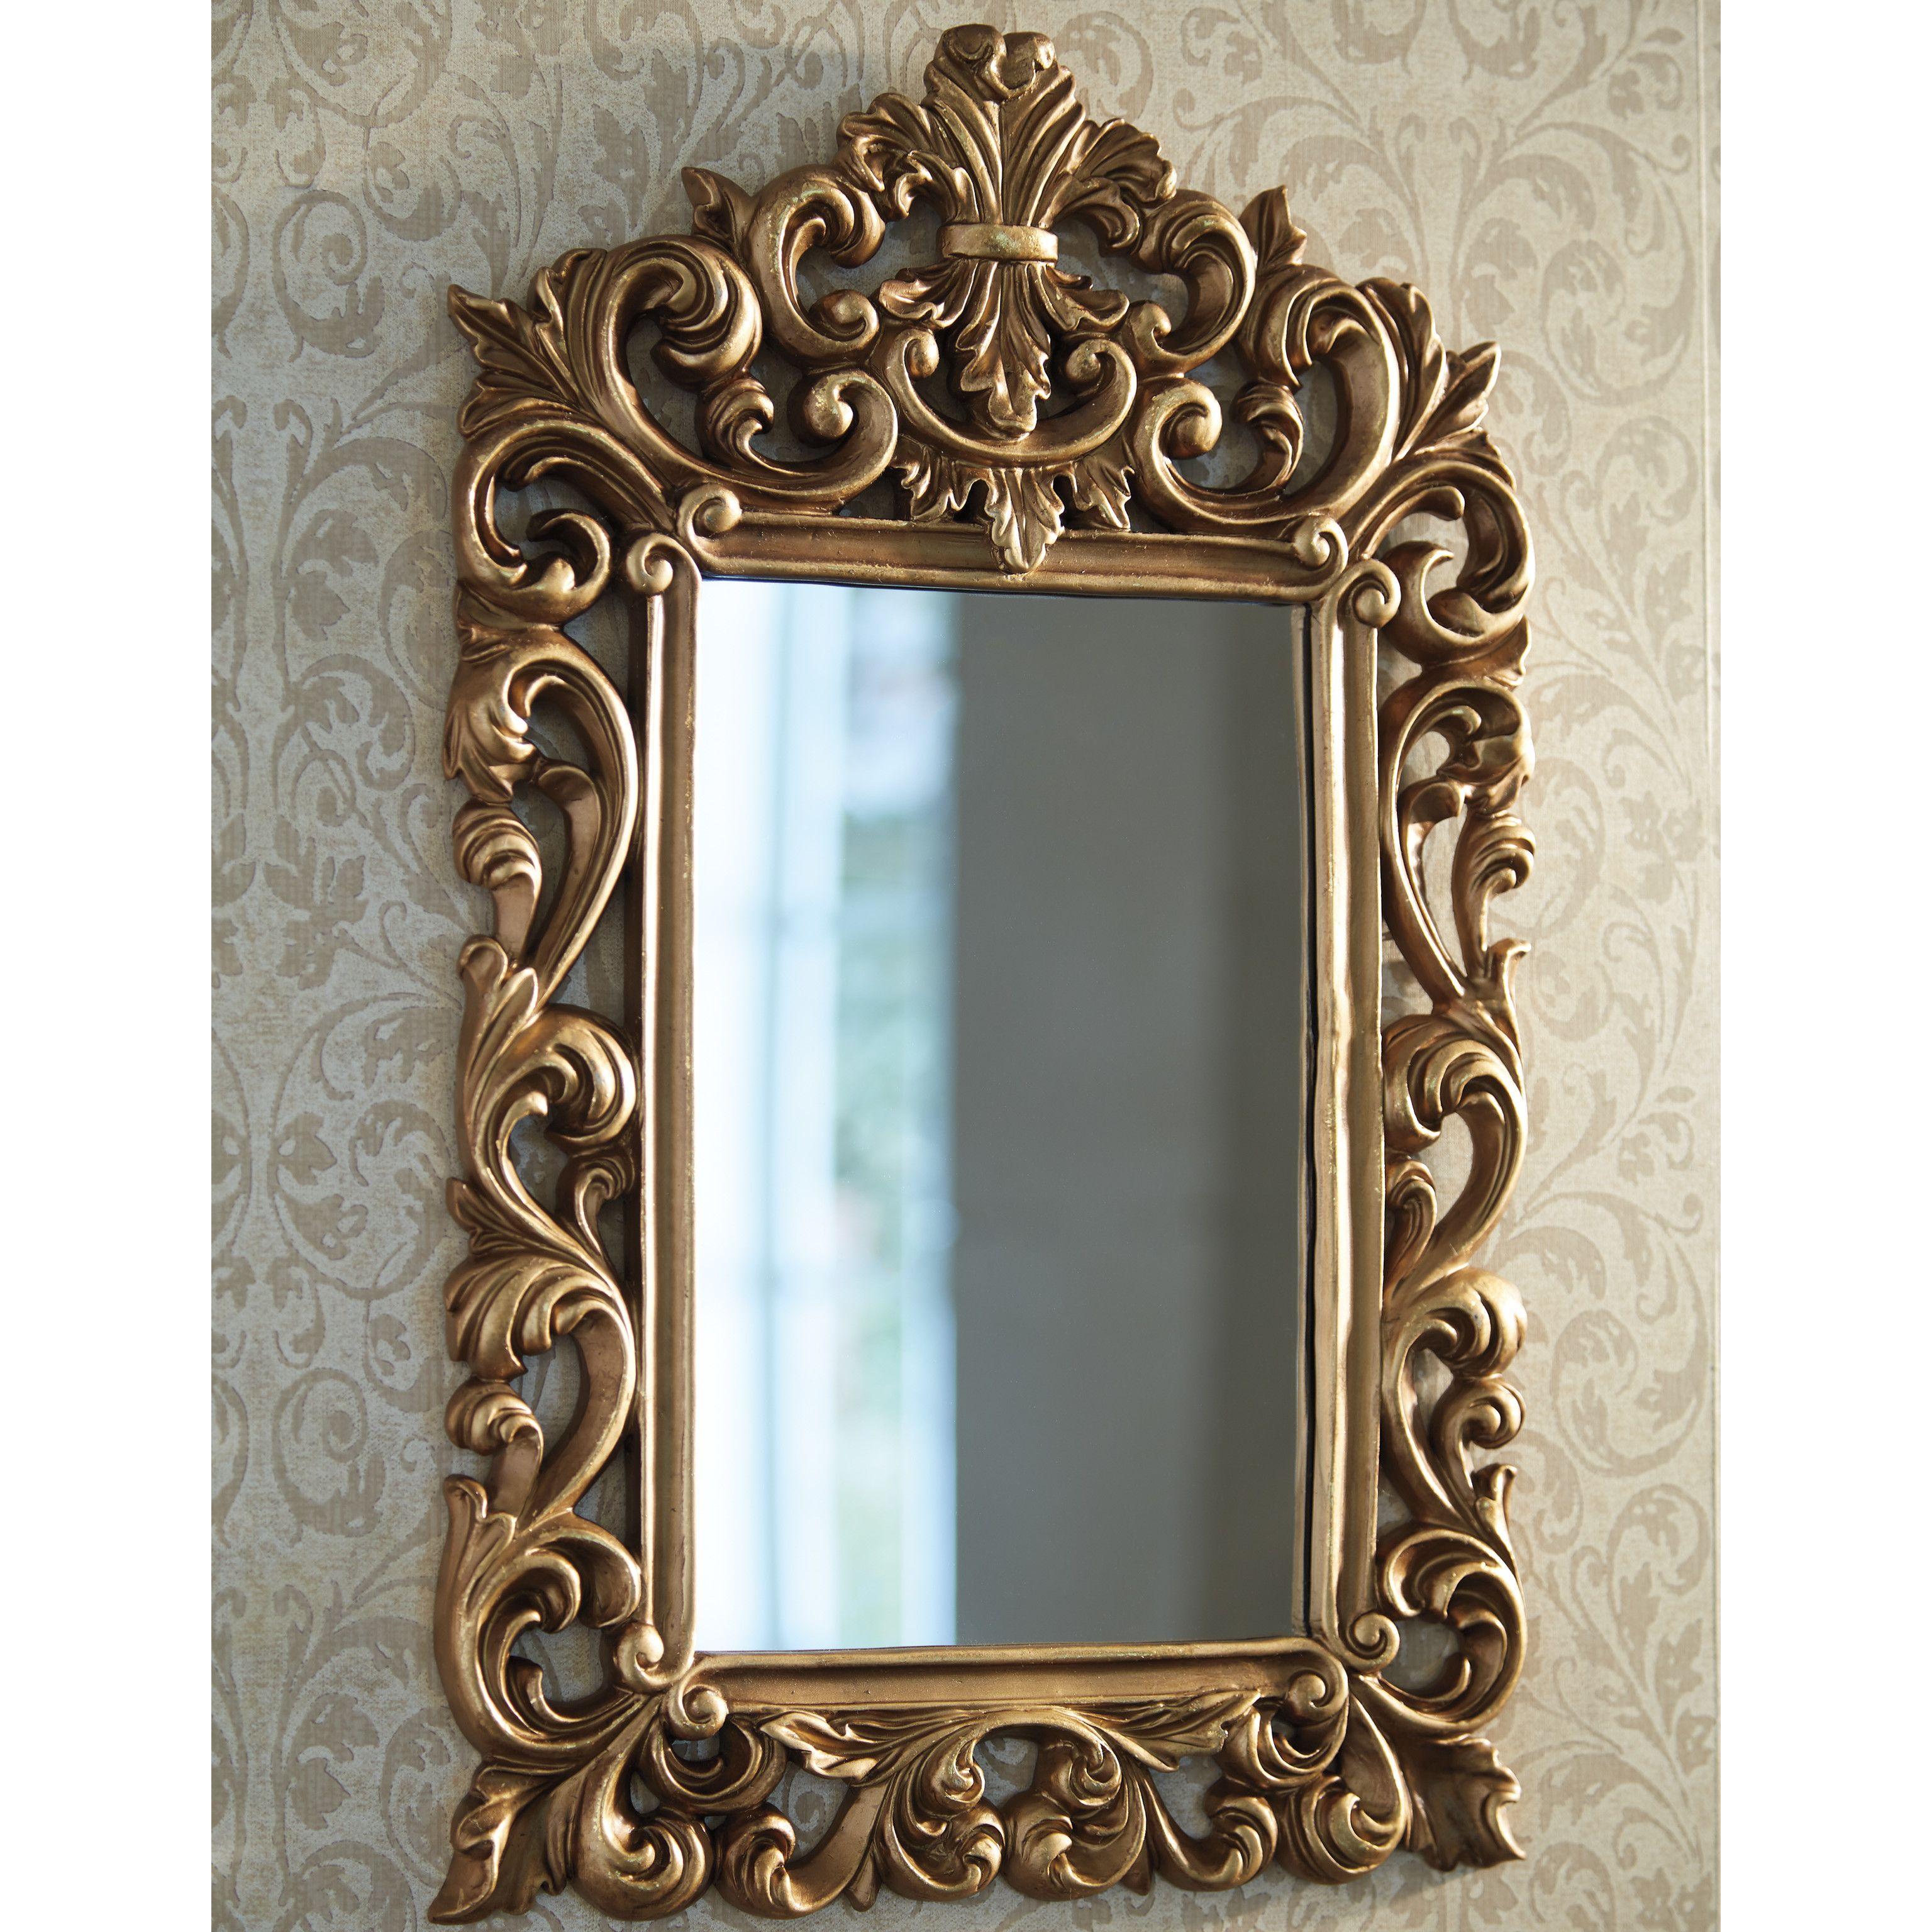 Astoria Grand Antique Gold Wall Mirror Wall Mirrors Entryway Antique Mirror Wall Gold Mirror Wall Antique gold wall mirror